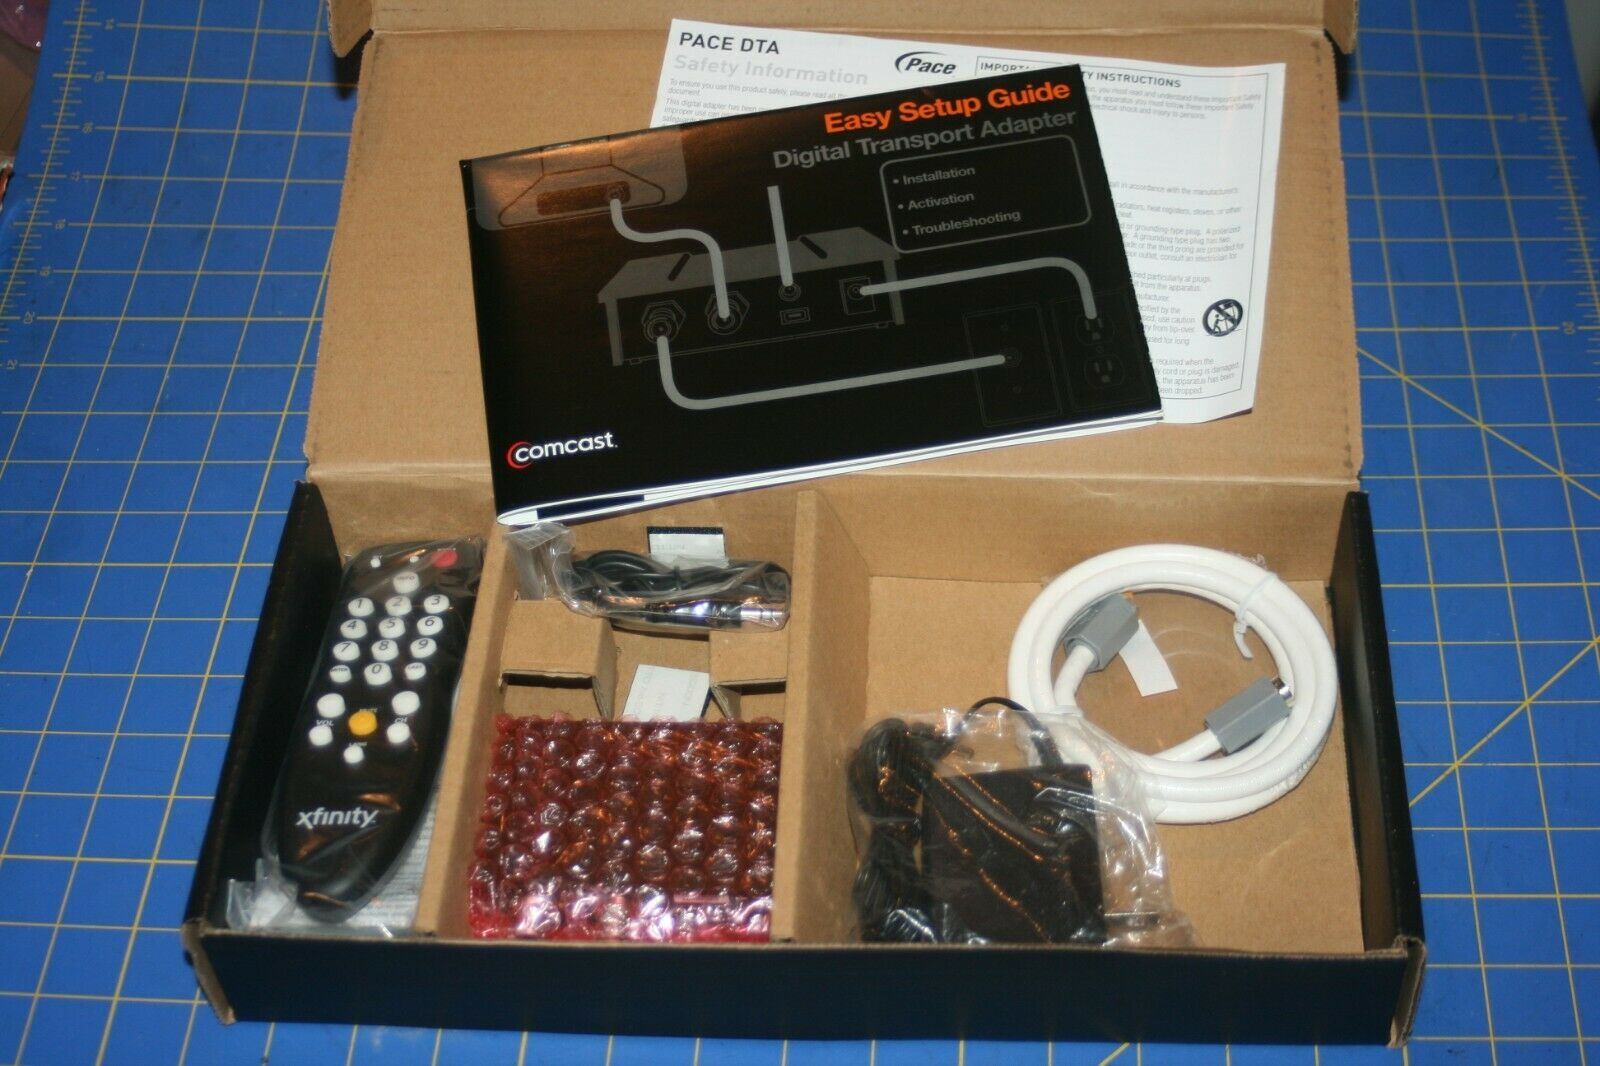 Comcast Xfinity DC50XU DTA Digital Adapter Kit C1863447400